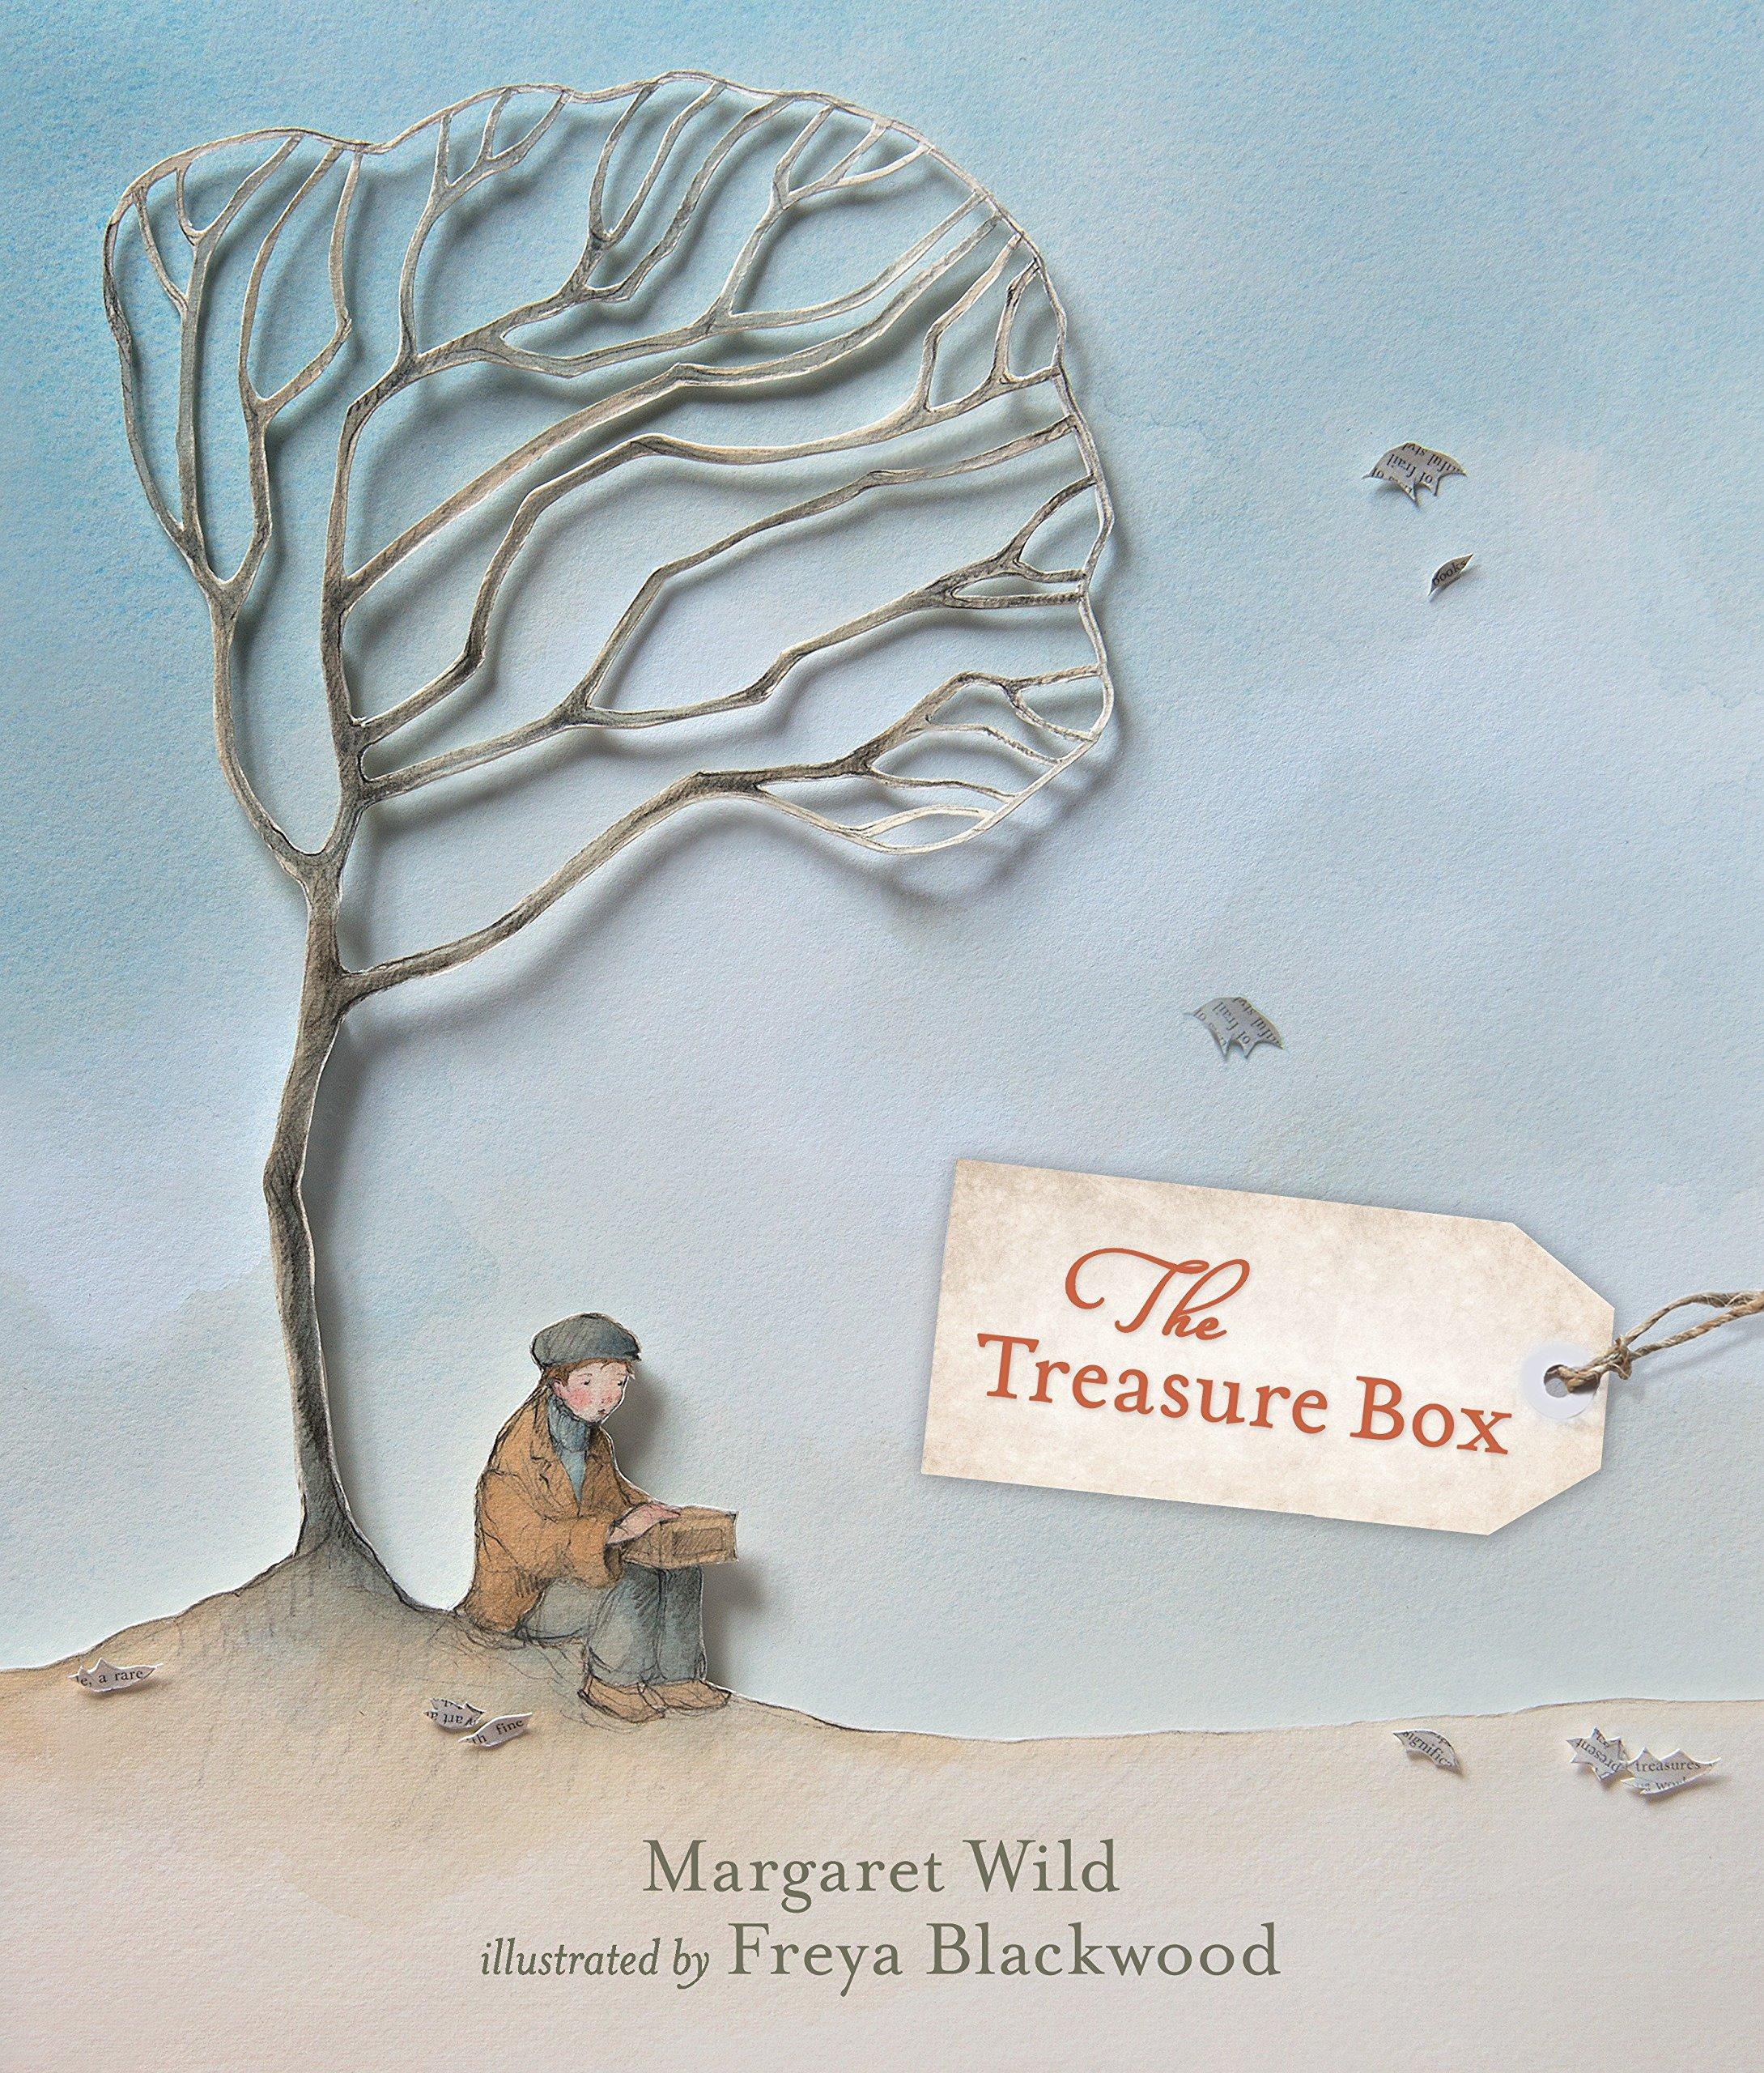 The Treasure Box : Wild, Margaret: Amazon.co.uk: Books